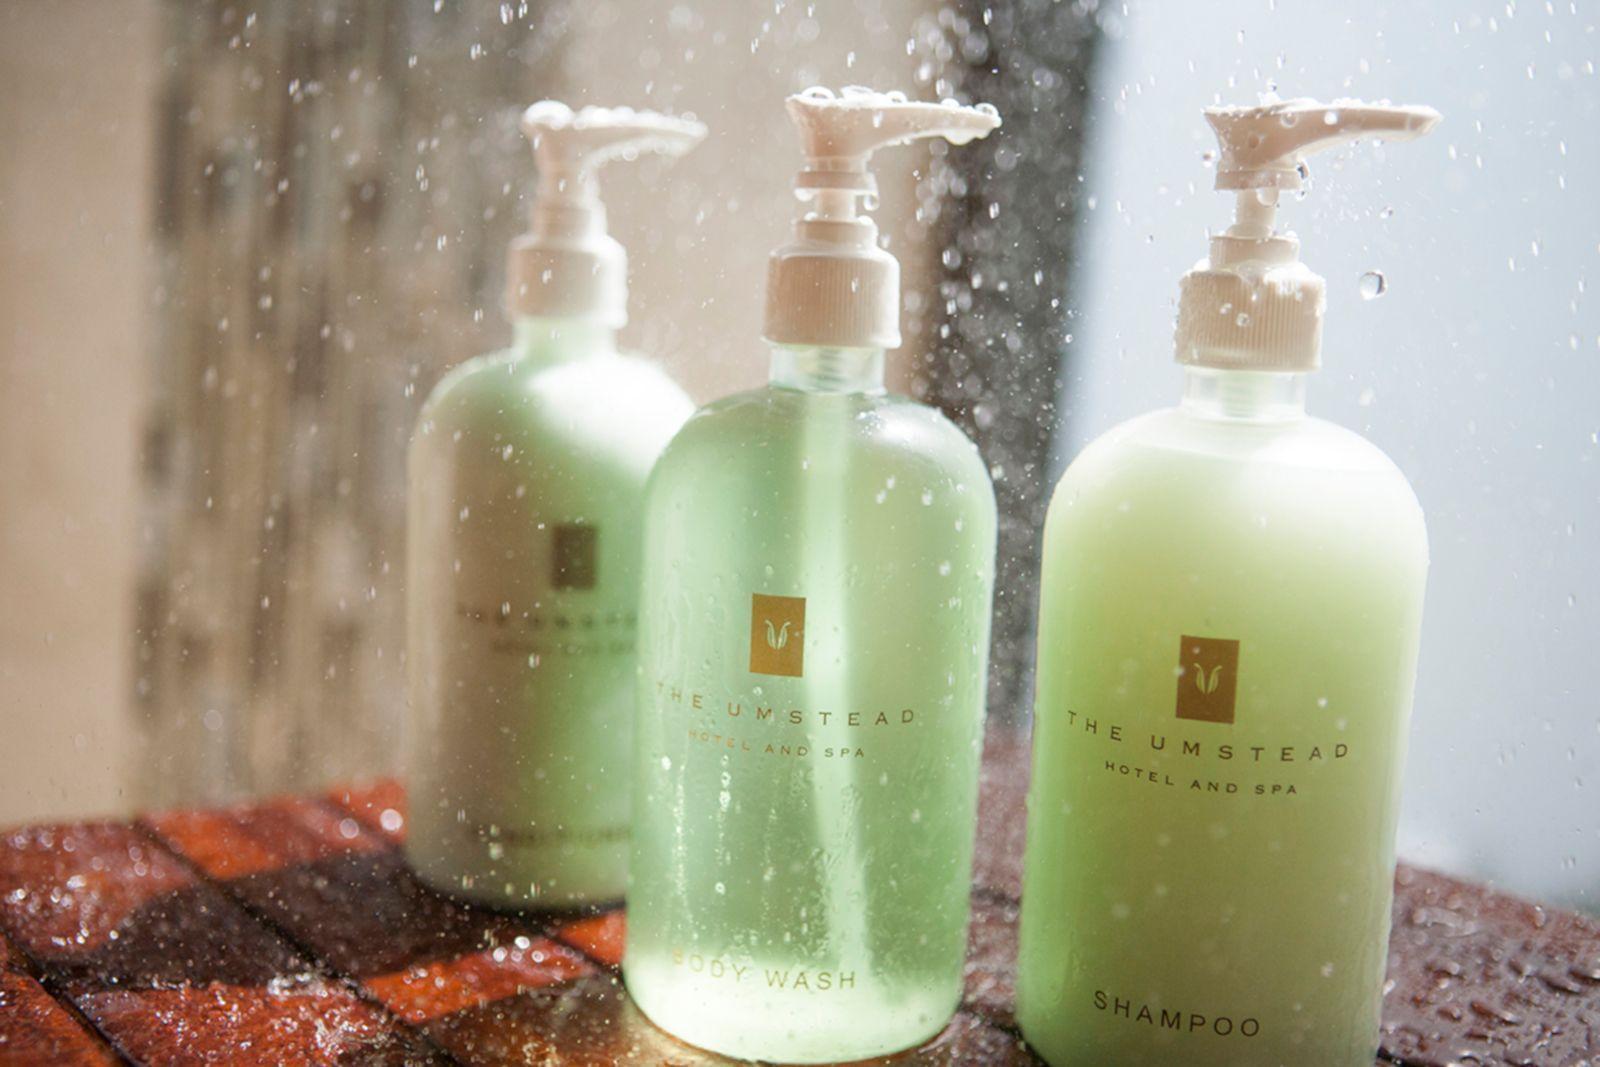 shampoo, body wash and conditioner